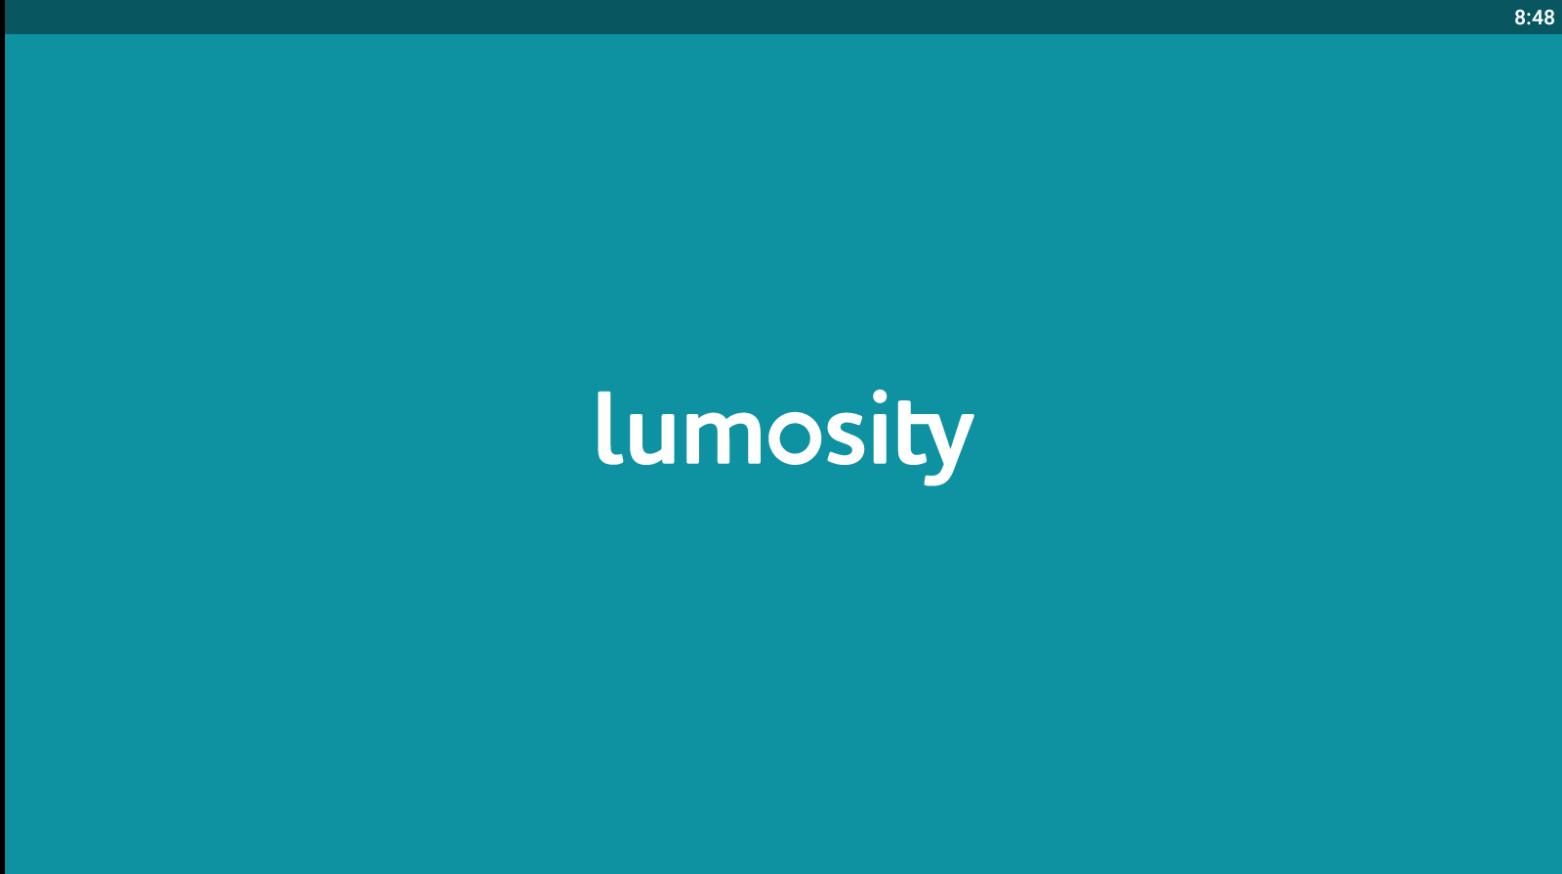 Lumosity 201906131910290 Full Apk Android 1562x874